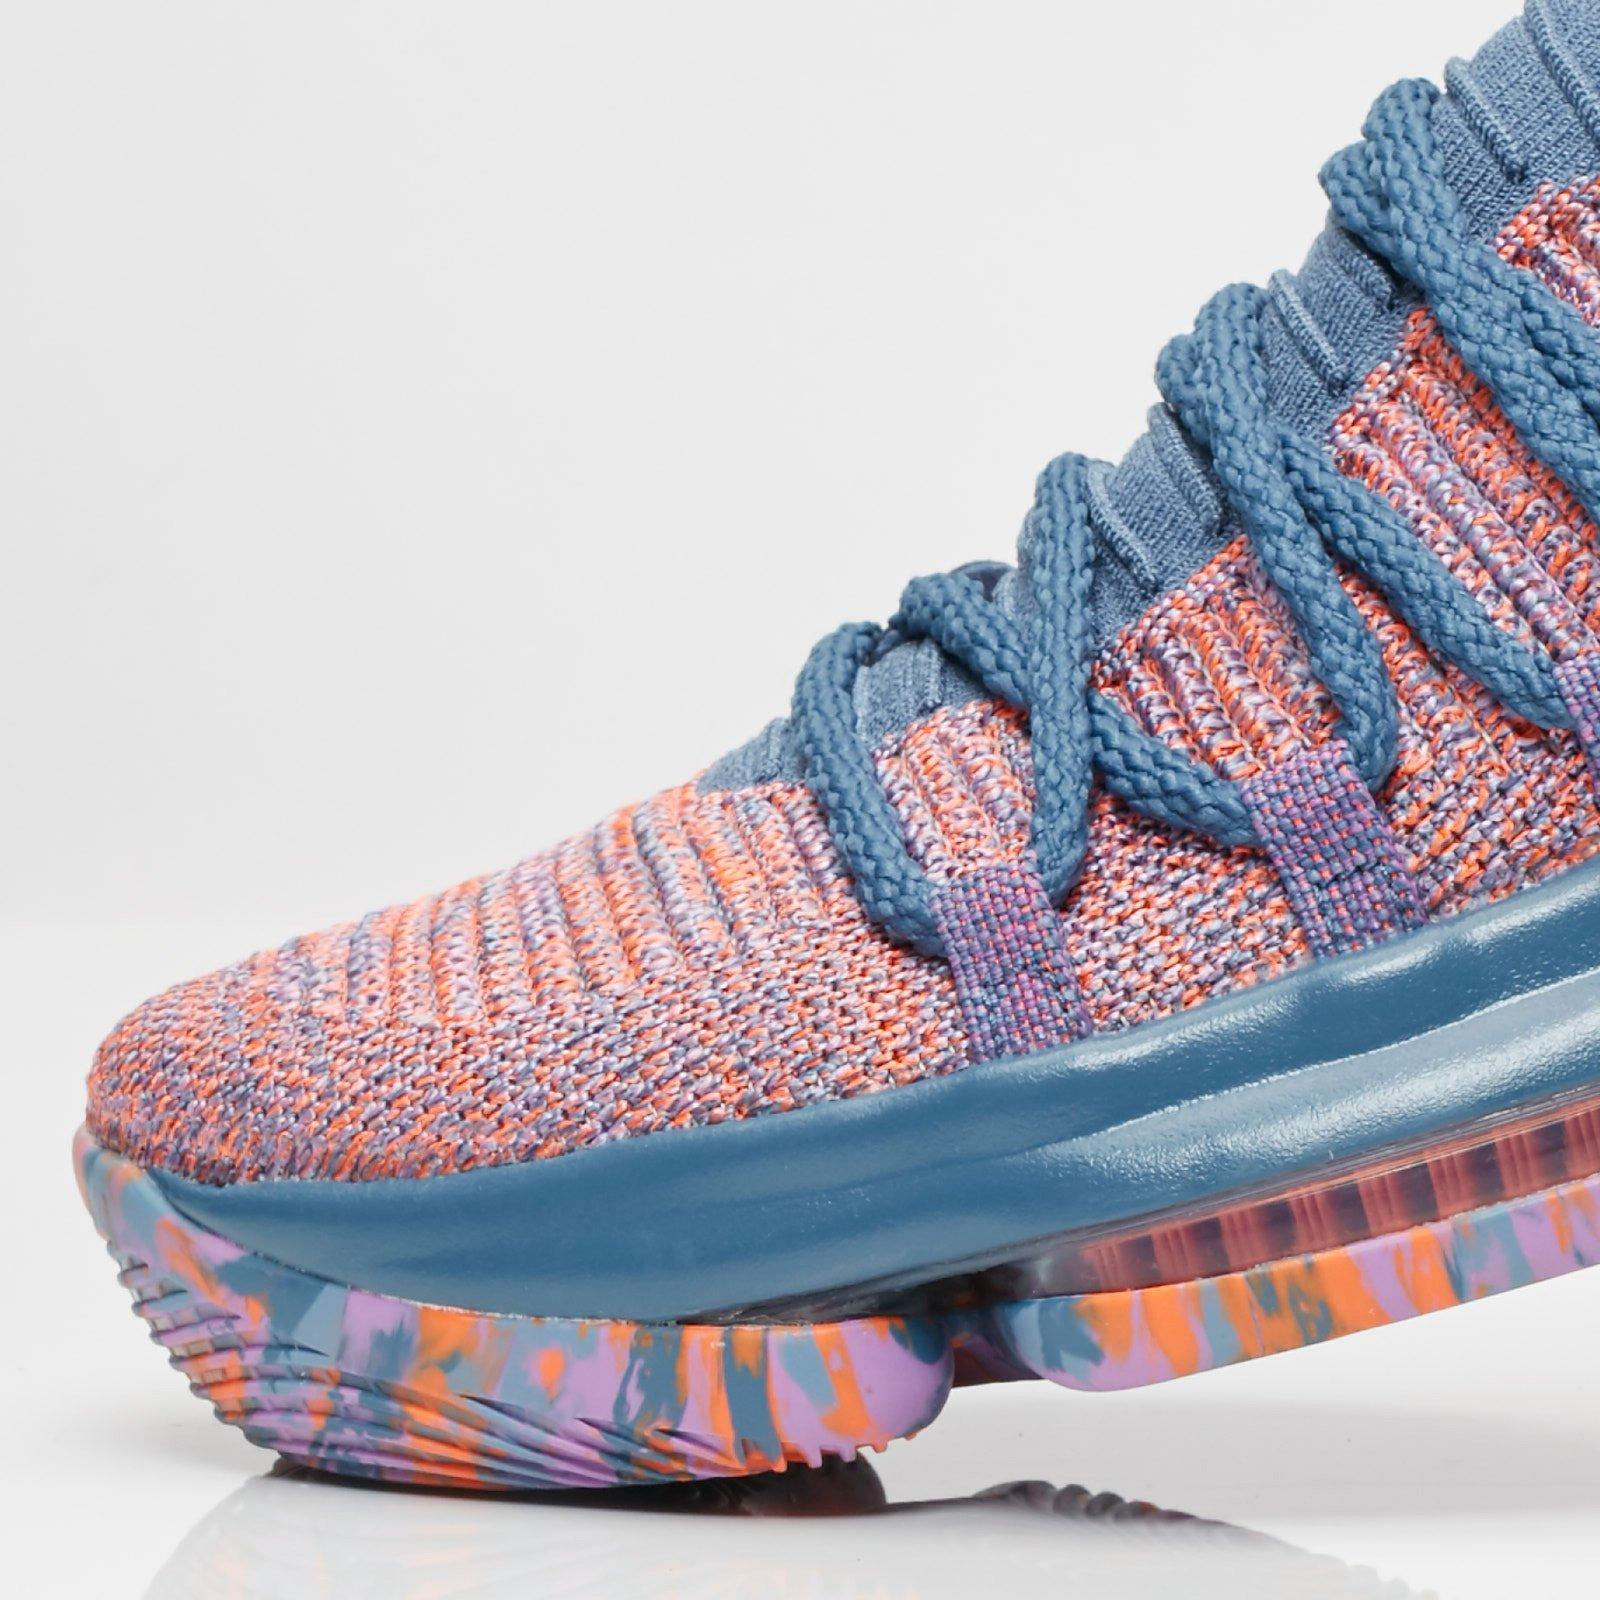 a5b69033518 Nike Zoom KD10 LMTD - 897817-400 - Sneakersnstuff